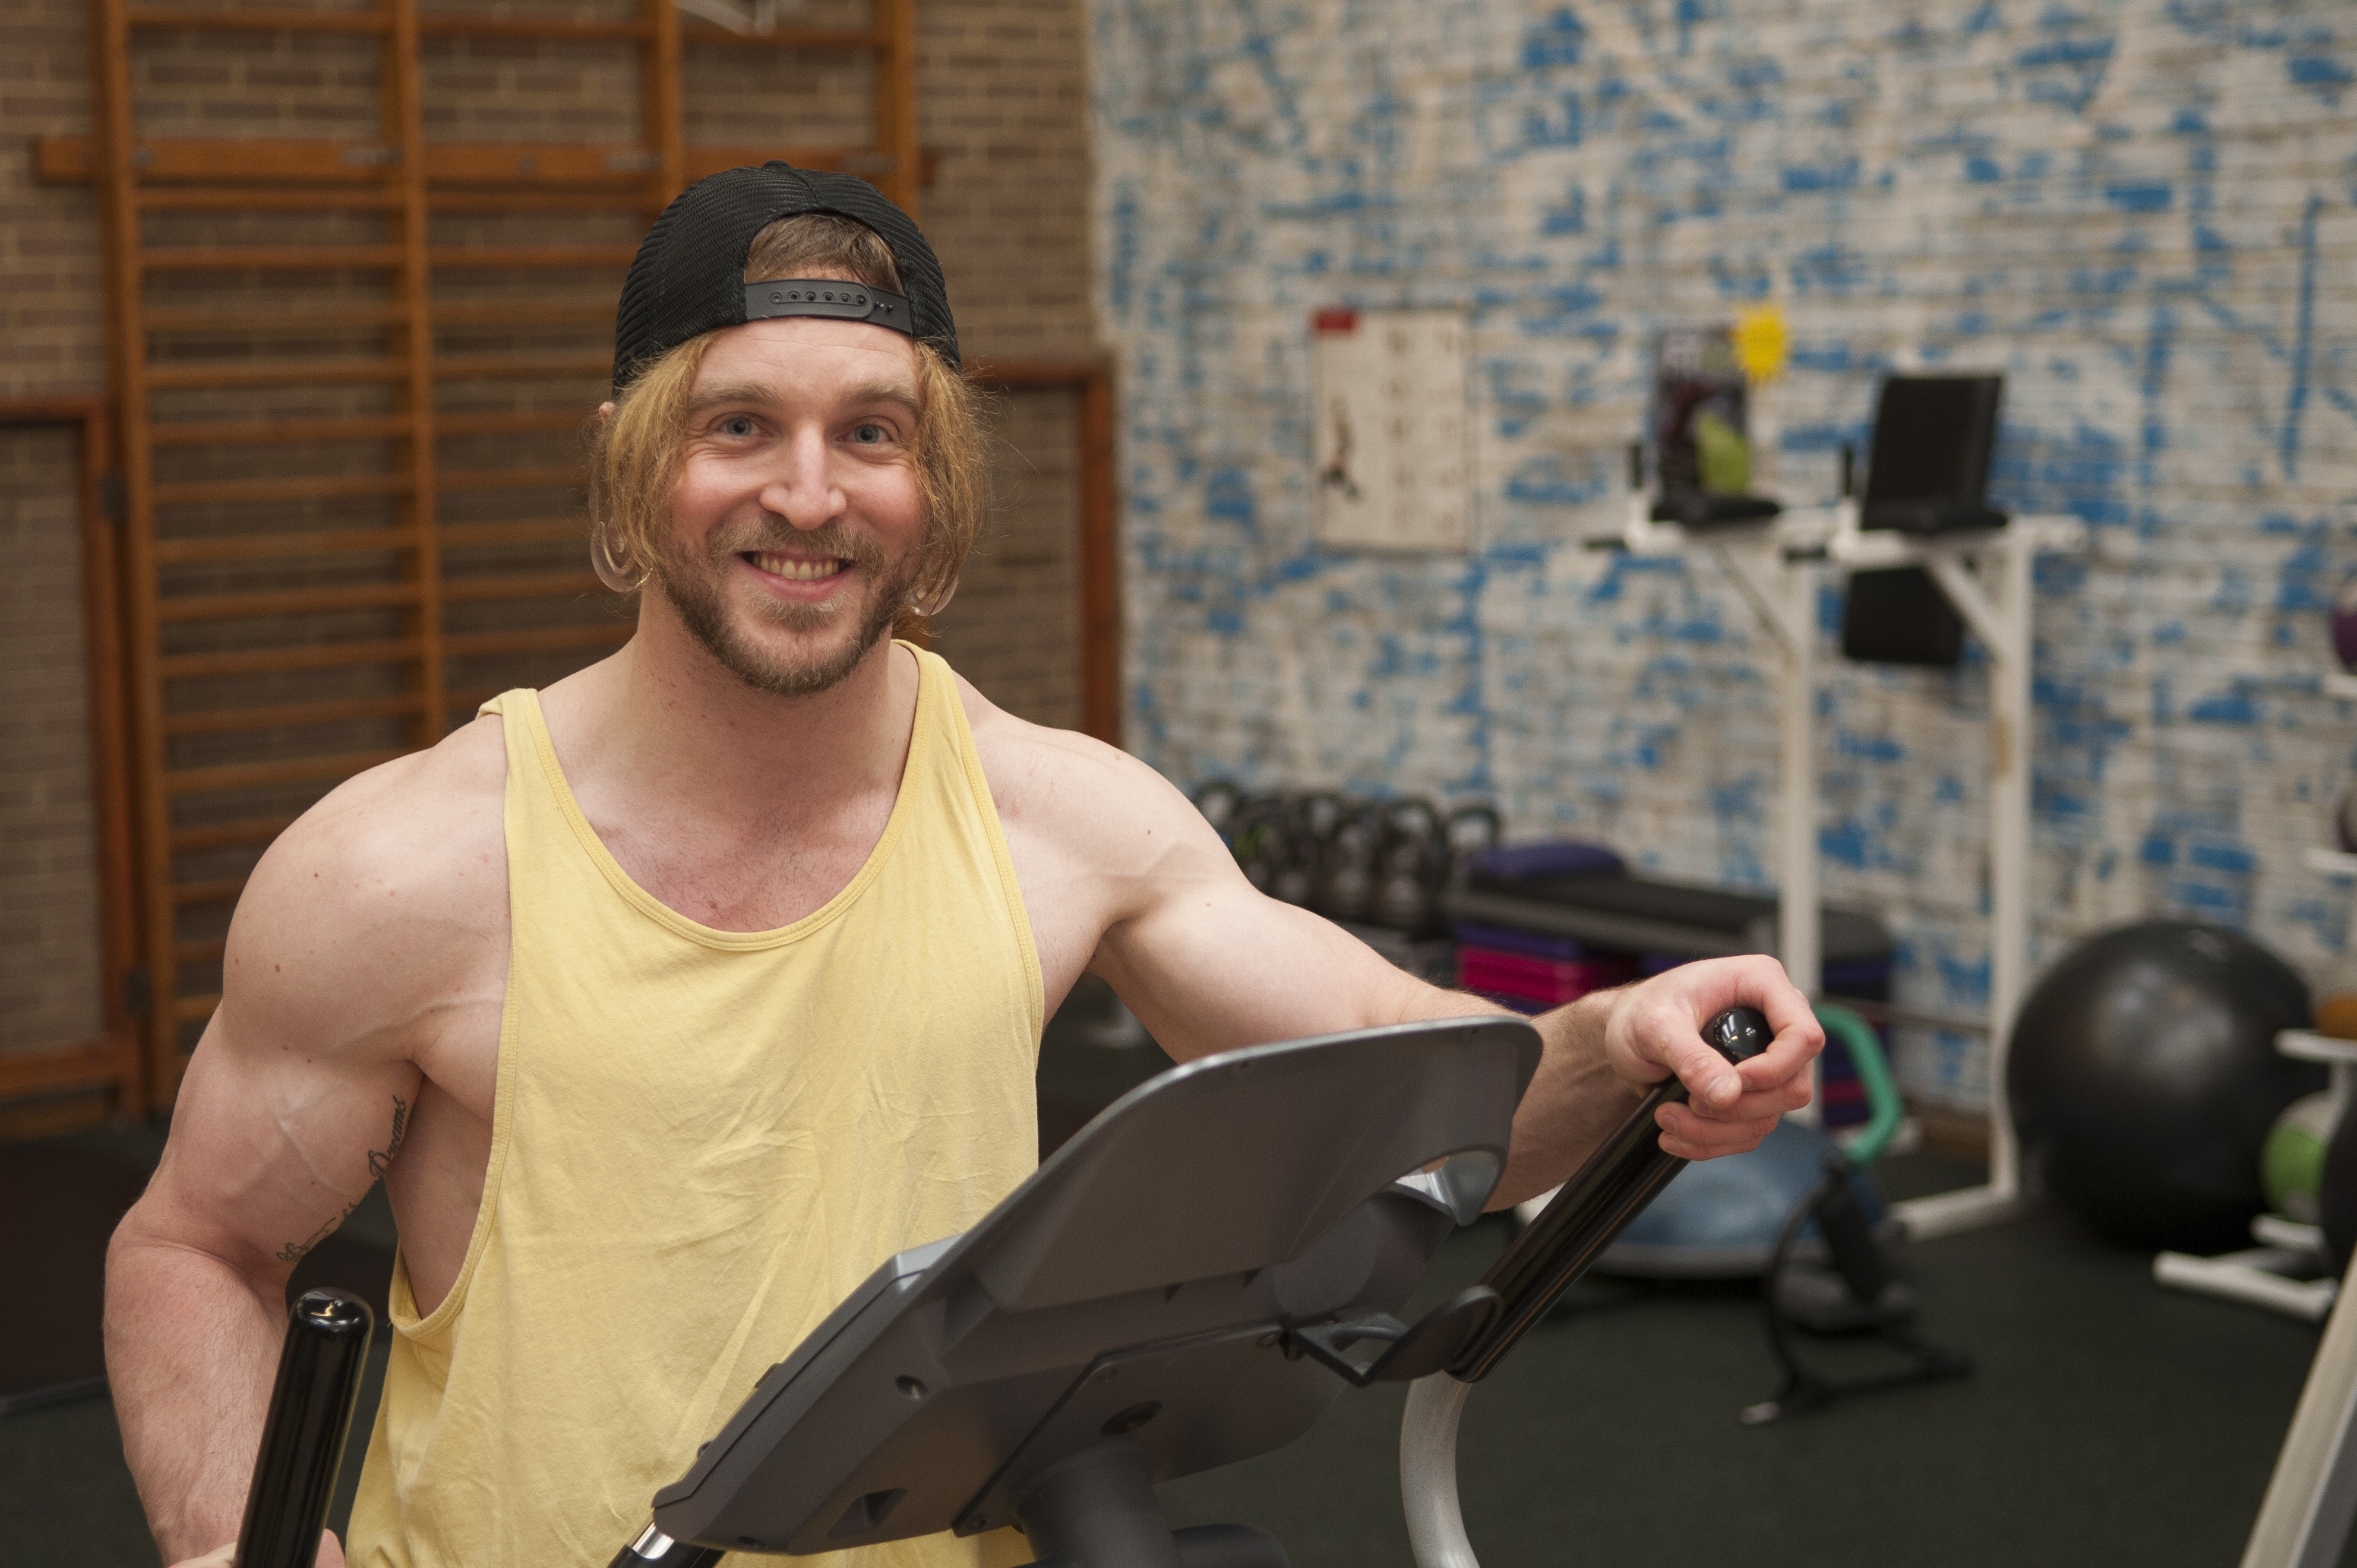 YMCA Wimbledon Kingston RB 16 274 of 799 - Gym & exercise classes at YMCA Wimbledon